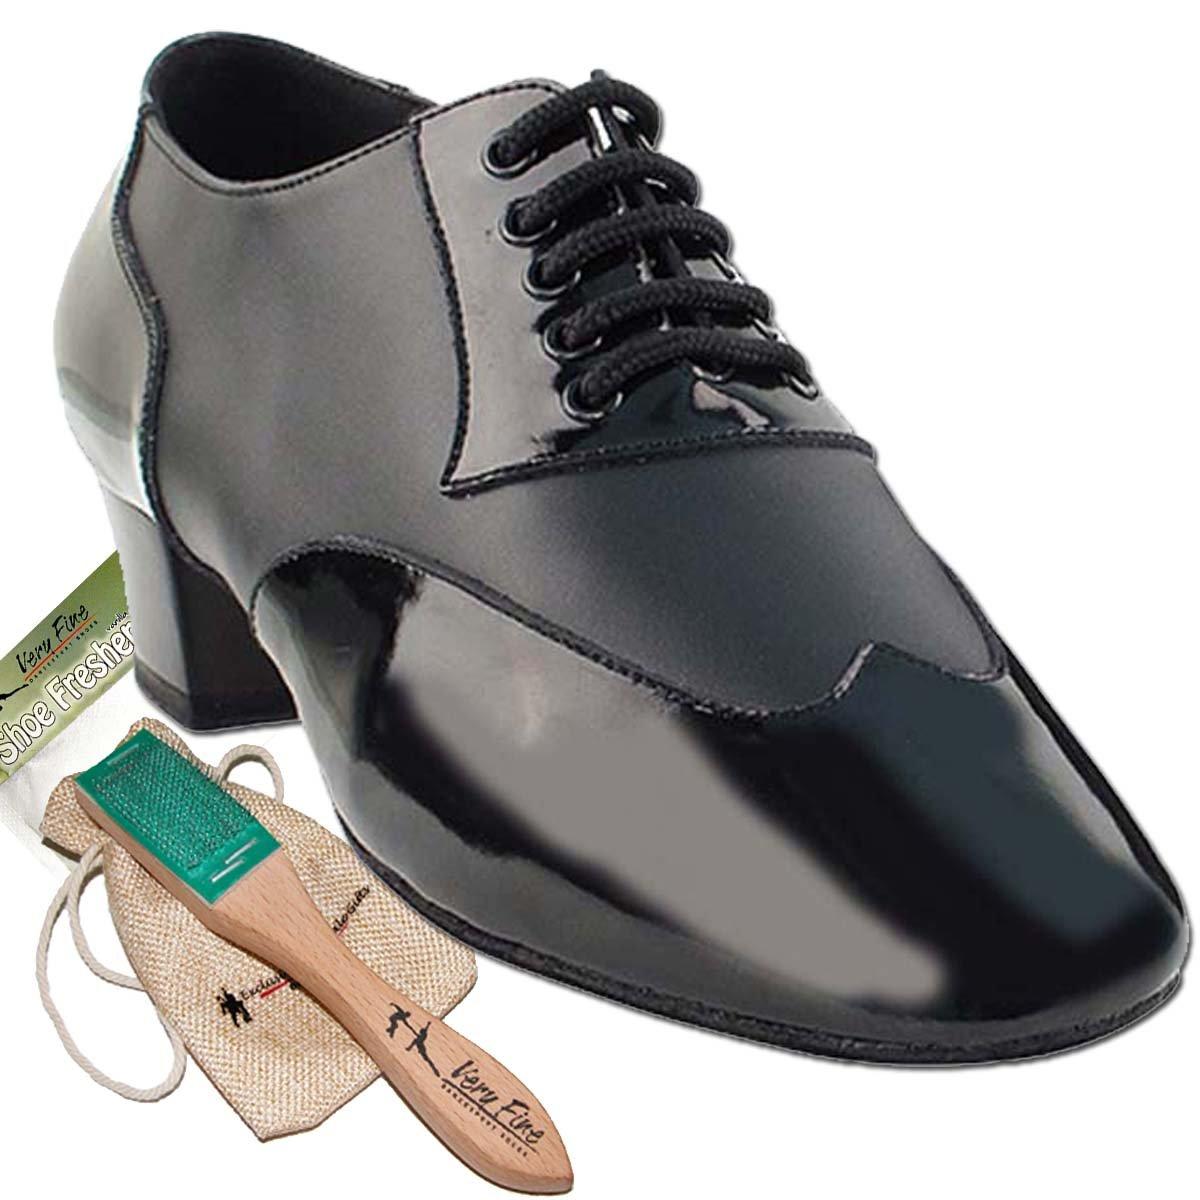 Mens Ballroom Dance Shoes Tango Wedding Salsa Latin Dance Shoes CM100101EB - Very Fine 1.5